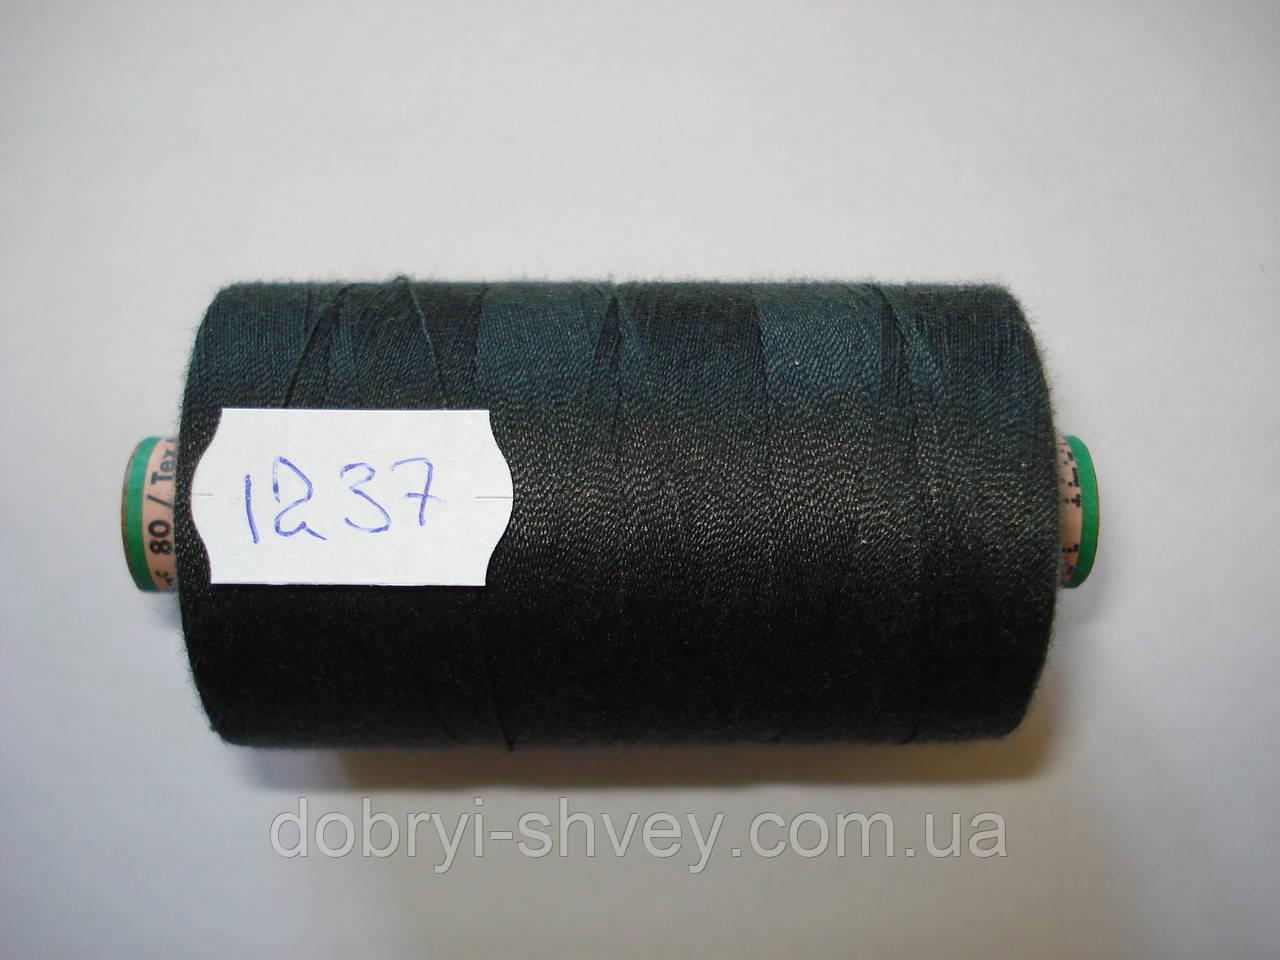 Нитка AMANN Saba c №80 1000м.col 1237 т.серый (шт.)